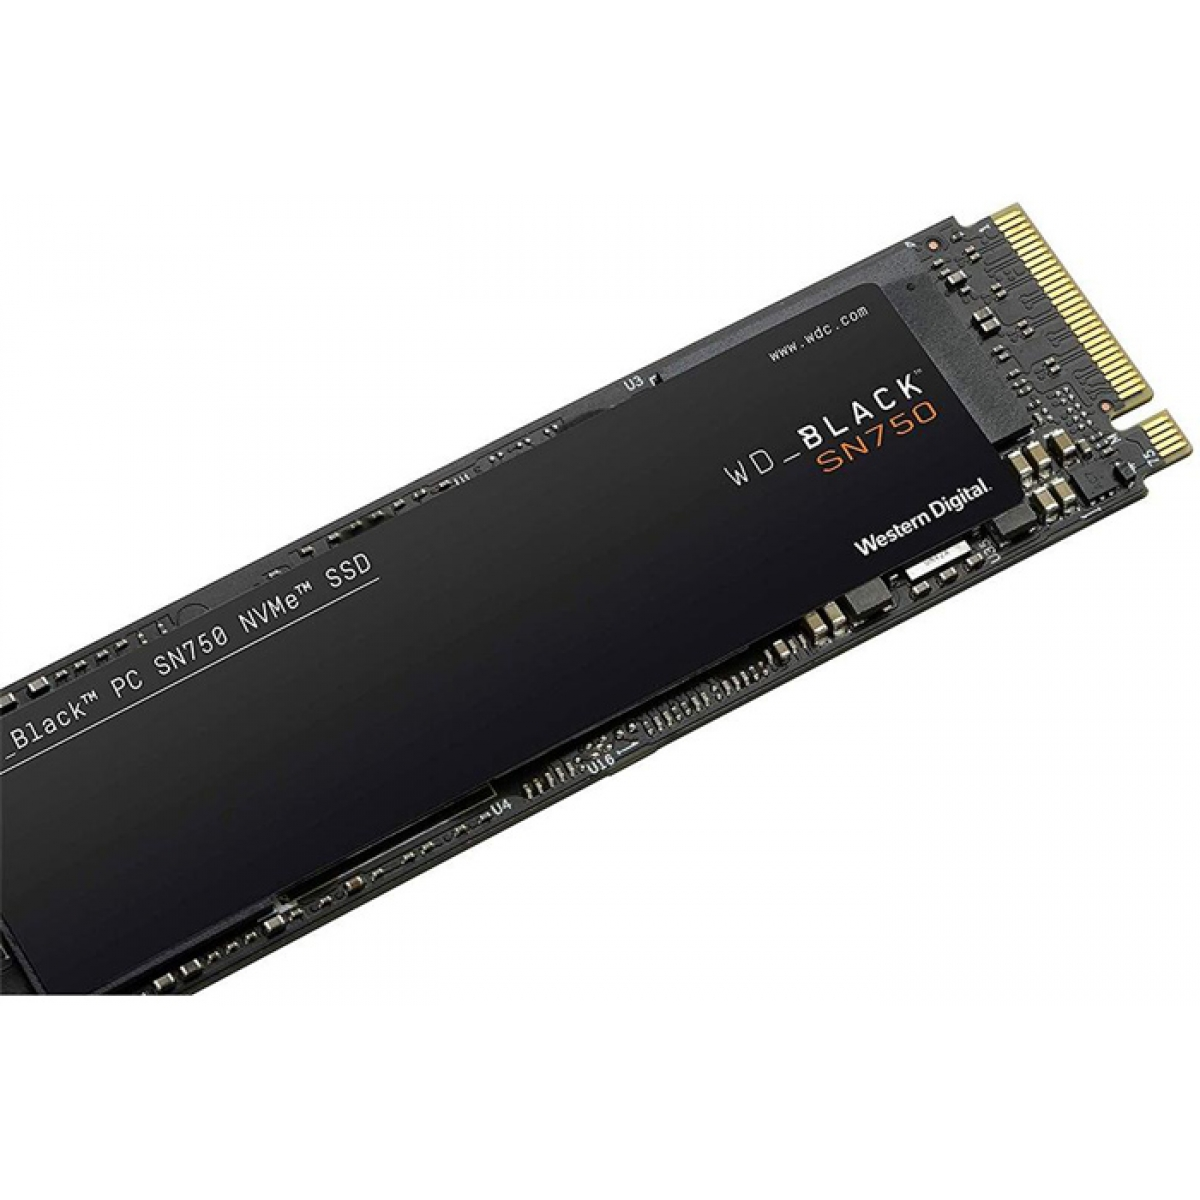 SSD WD Black SN750, 1TB, M.2 2280, NVMe, Leitura: 3430MBs e Gravação: 3000MBs, WDS100T3X0C